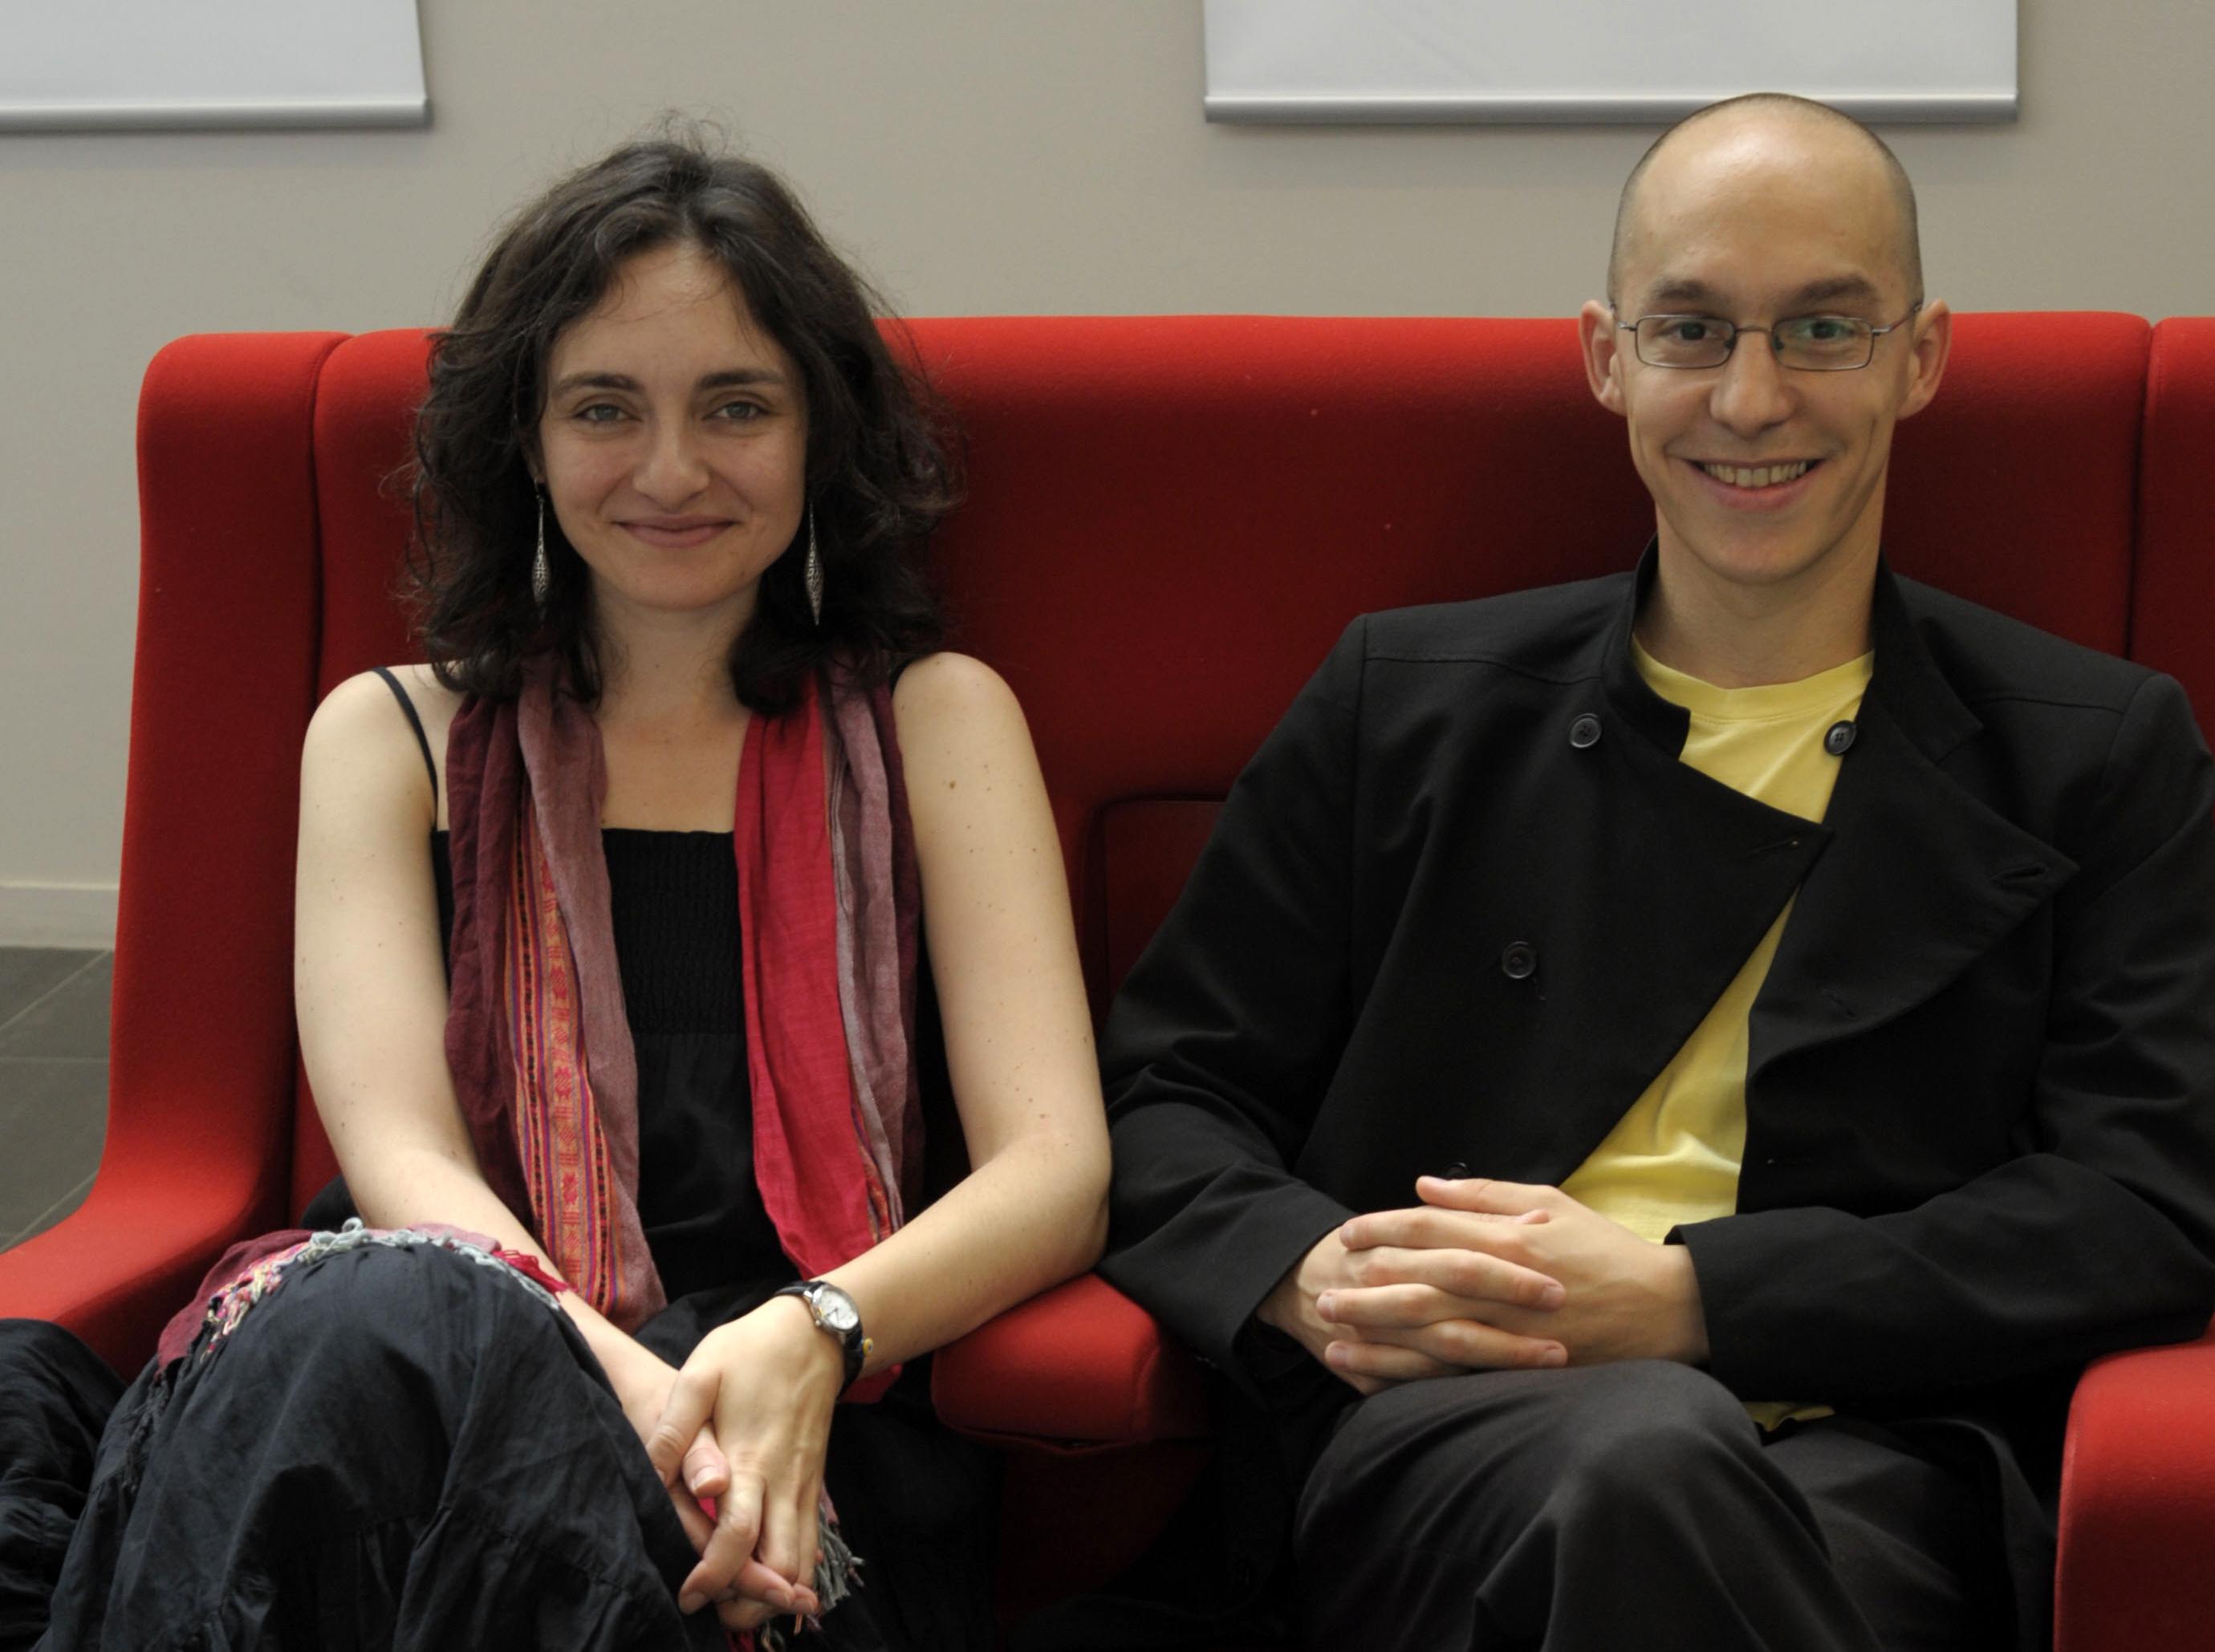 'Noor' directors í‡aÄŸla Zencirci and Guillaume Giovanetti